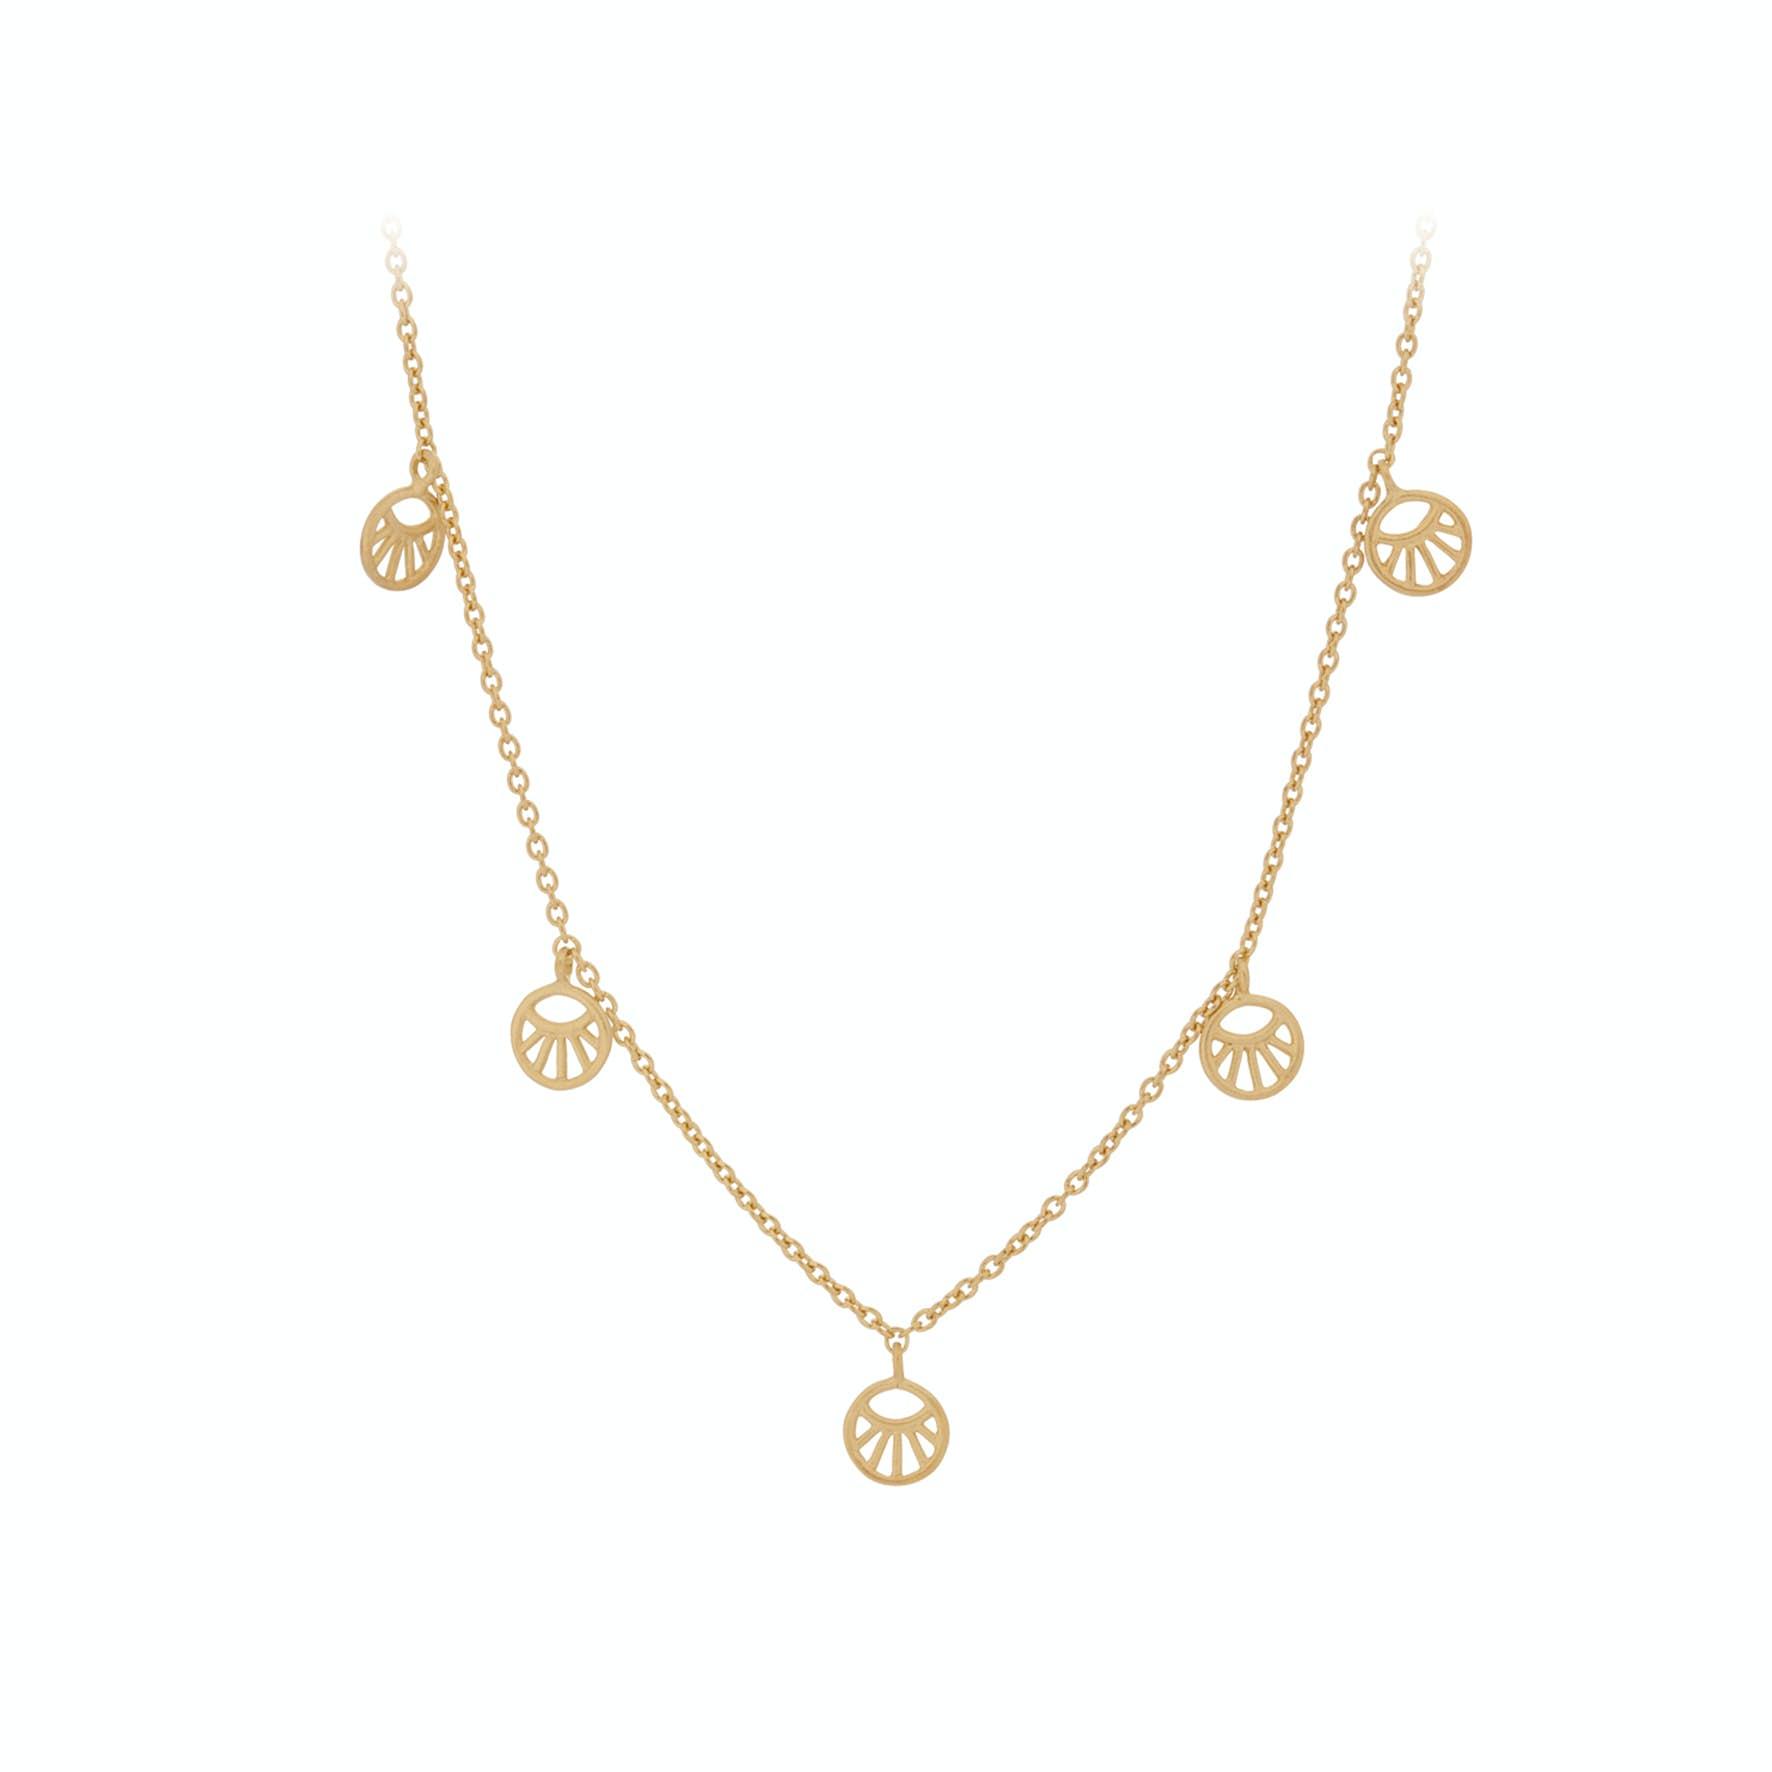 Mini Daylight Necklace fra Pernille Corydon i Forgylt-Sølv Sterling 925